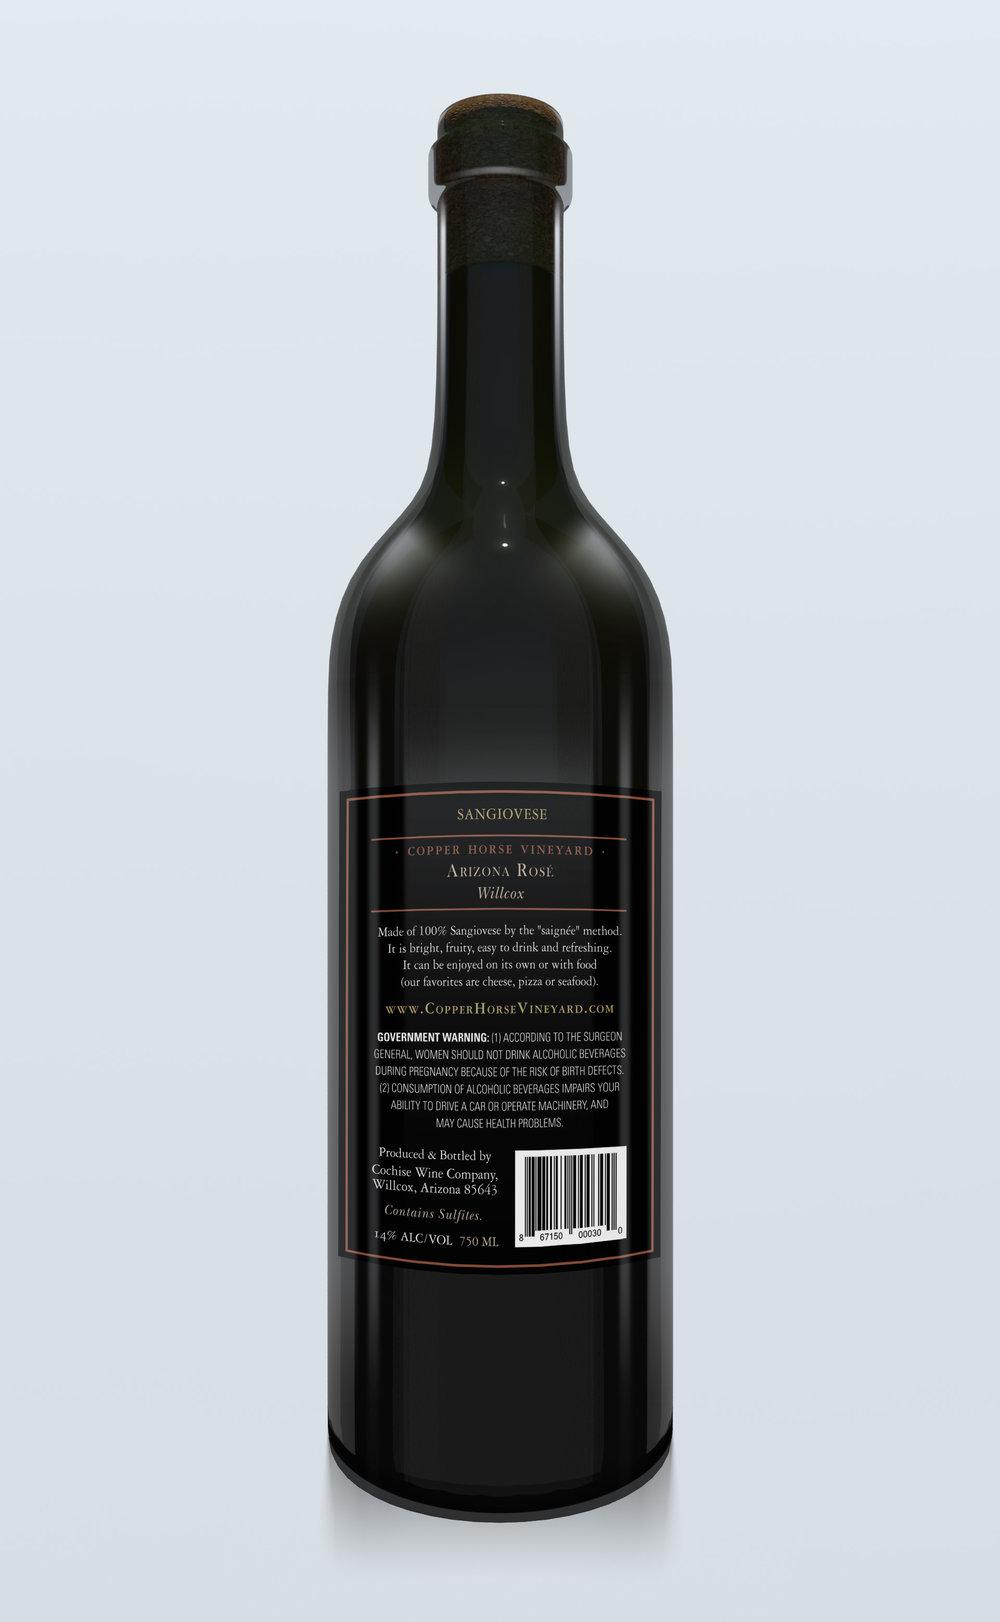 Mock up of the back label on the bottle